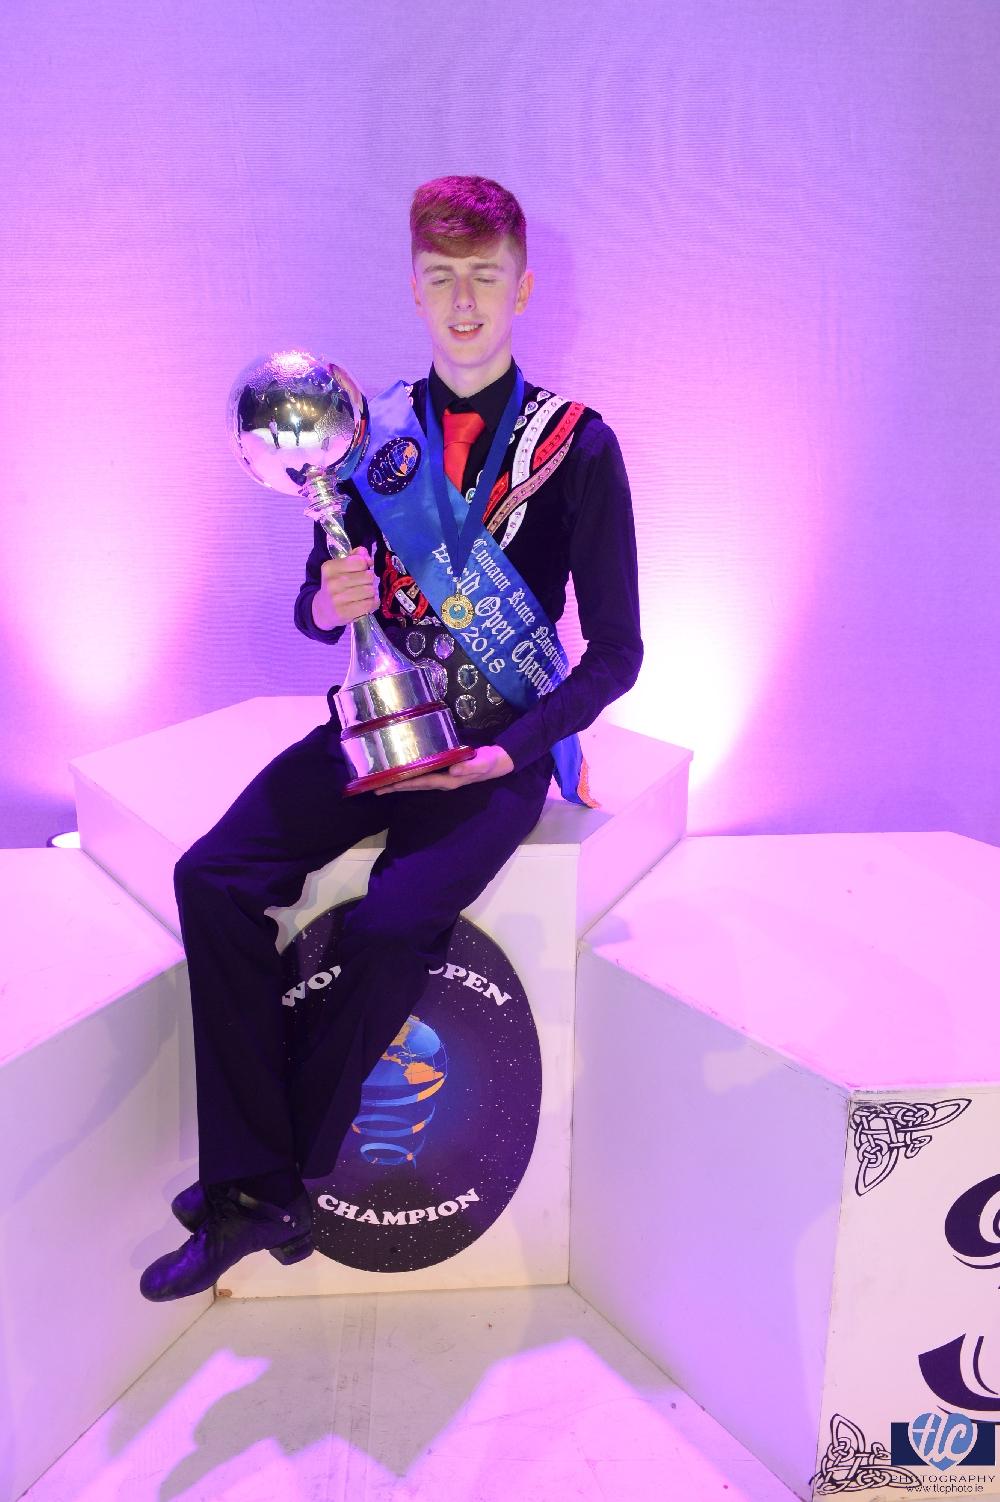 Under 17 Boys Championship winner